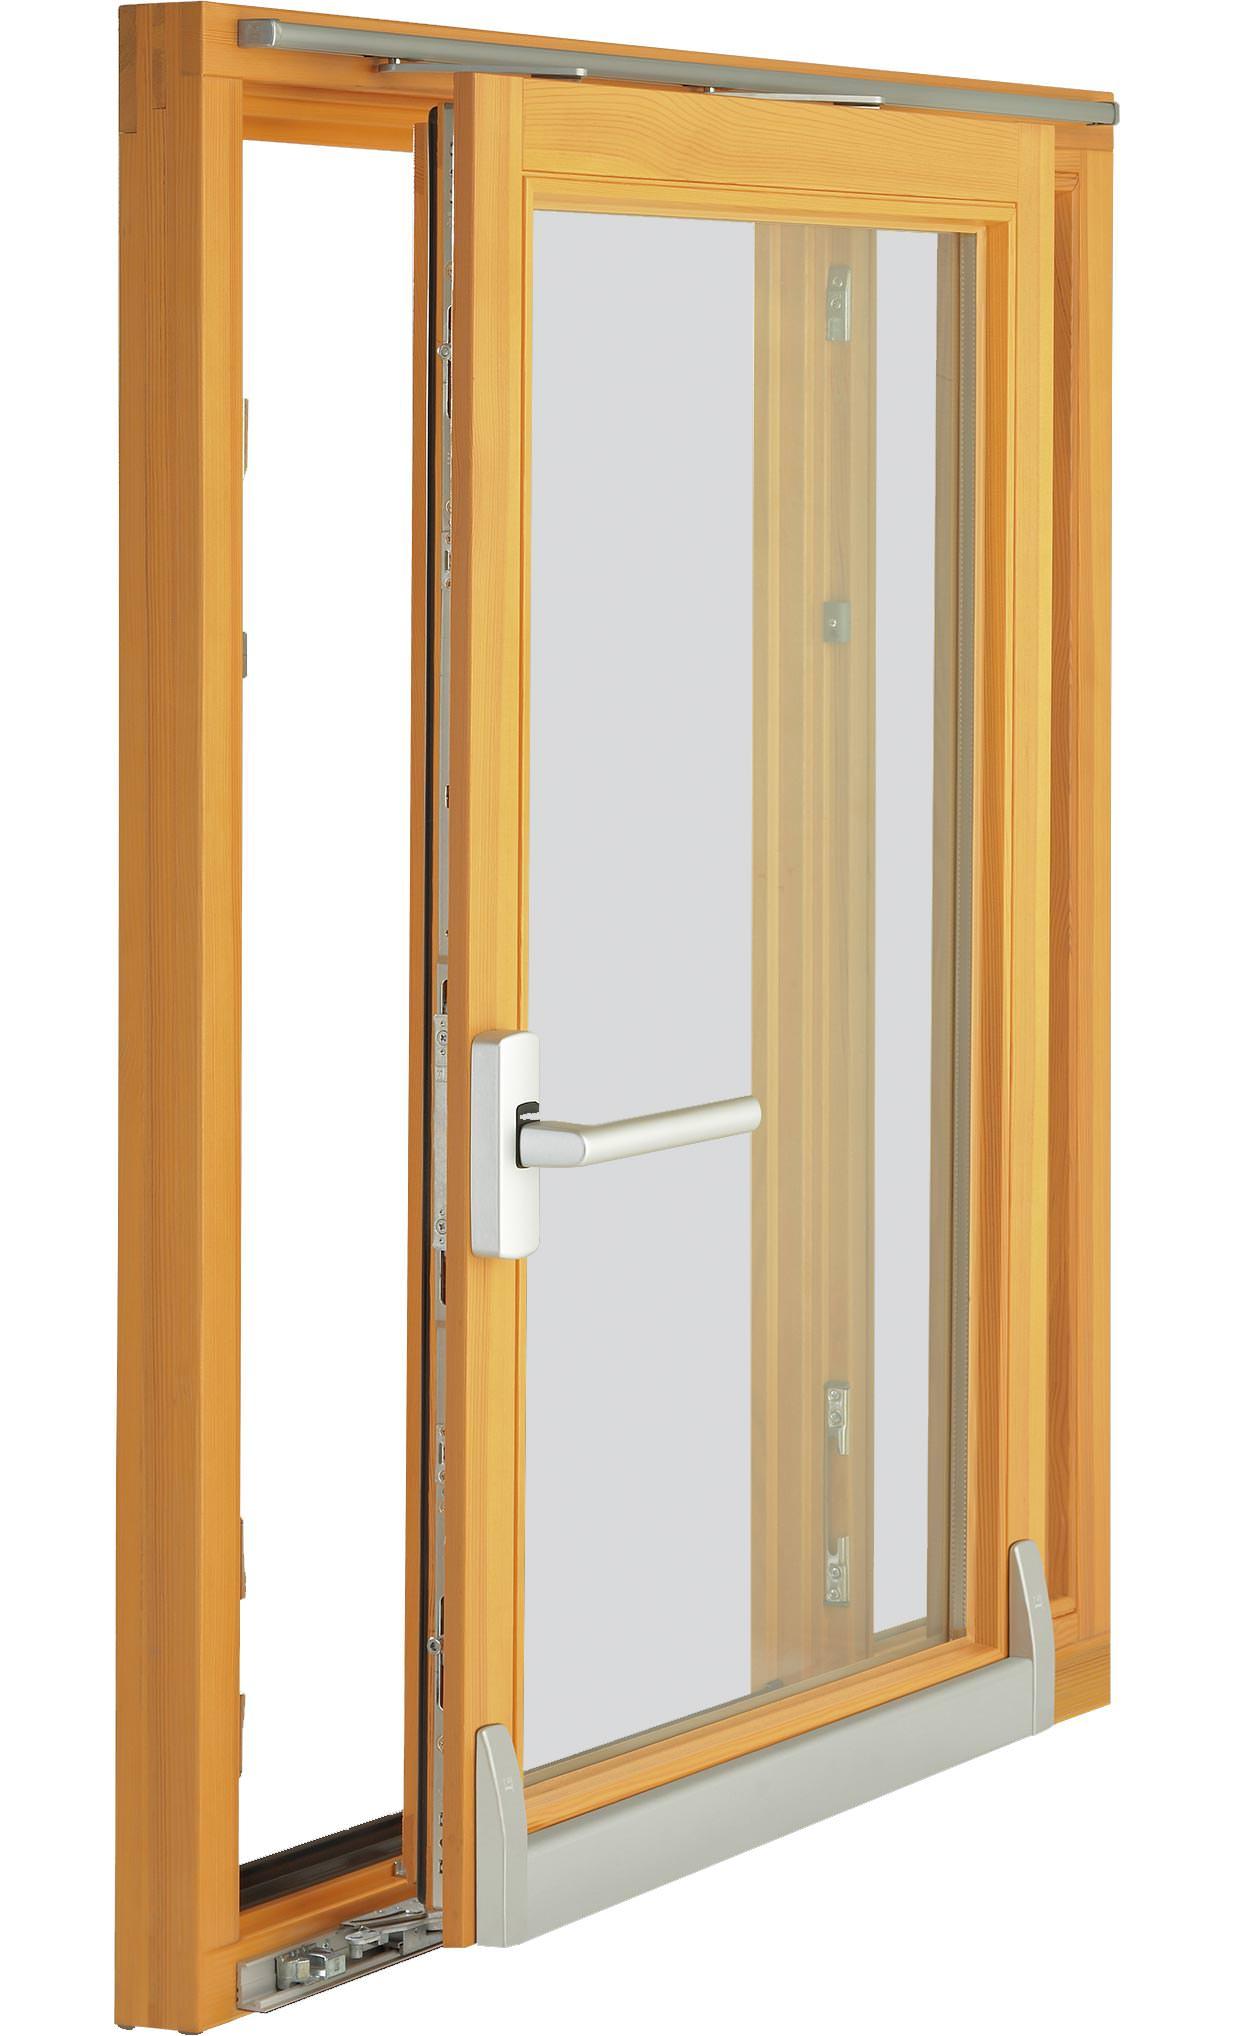 parallel schiebe kipp system neu von siegenia f r holz holz alu und kunststoff profile. Black Bedroom Furniture Sets. Home Design Ideas